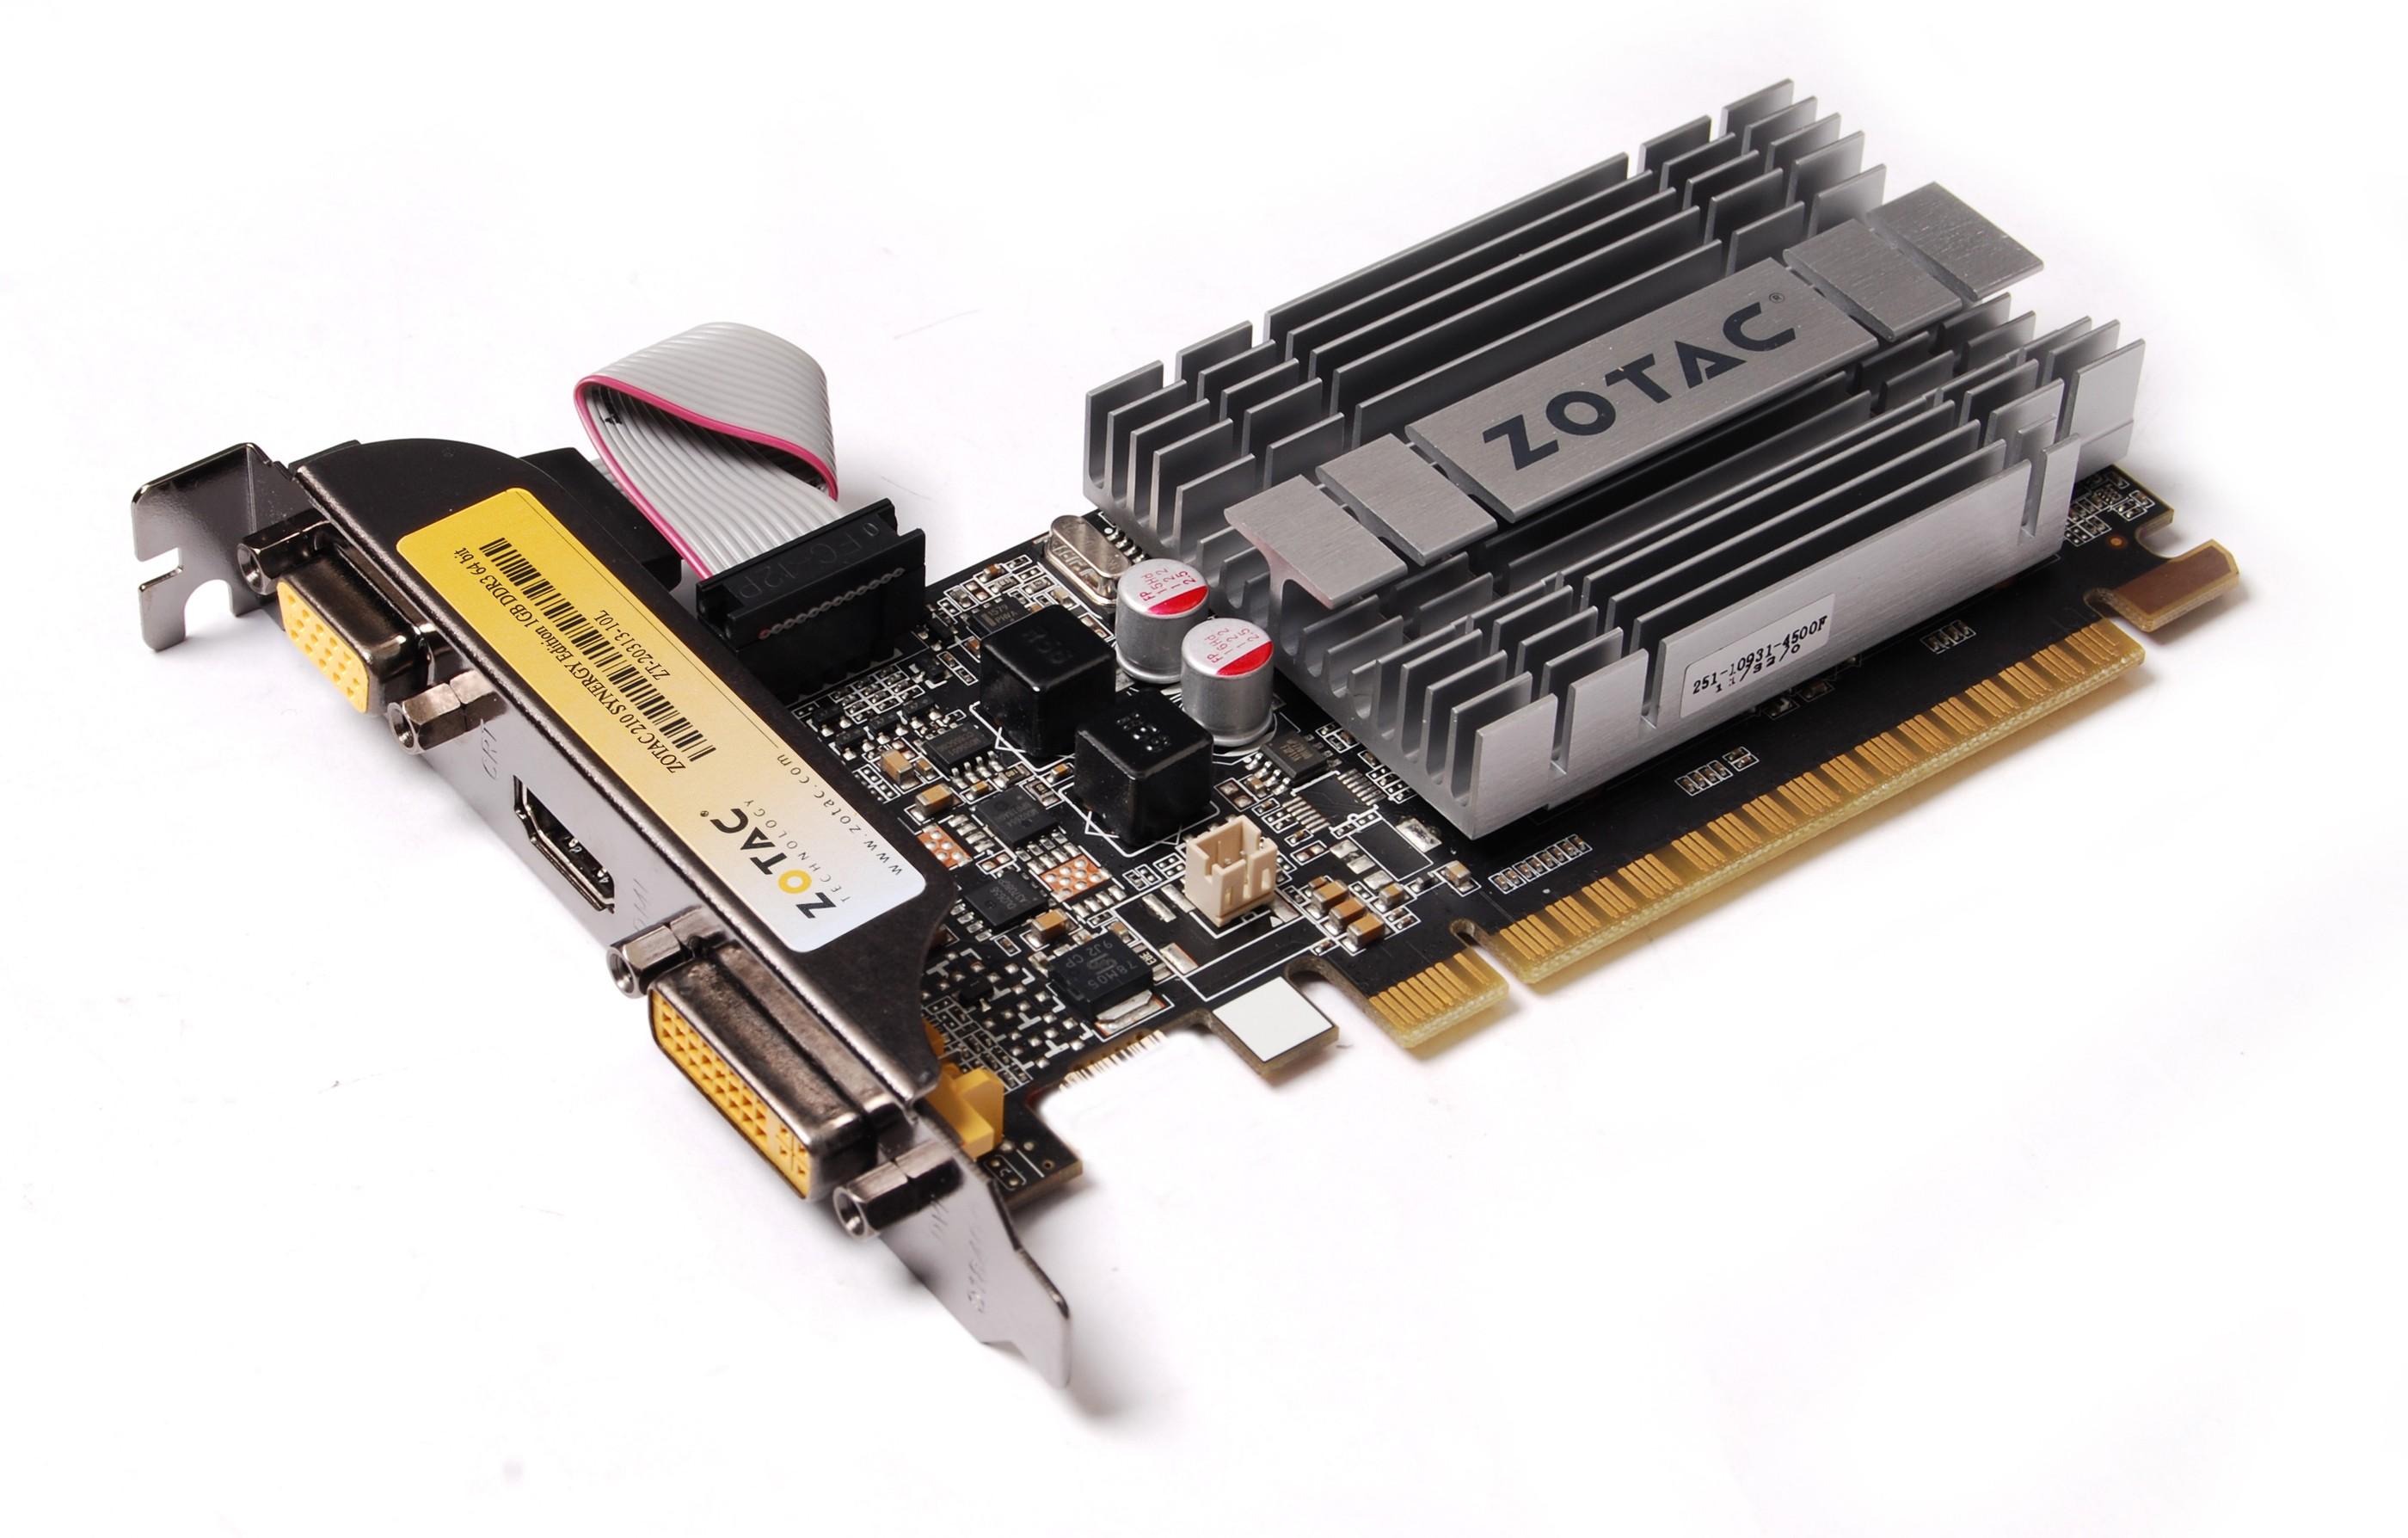 Zotac Nvidia Geforce 210 1gb Drivers Download